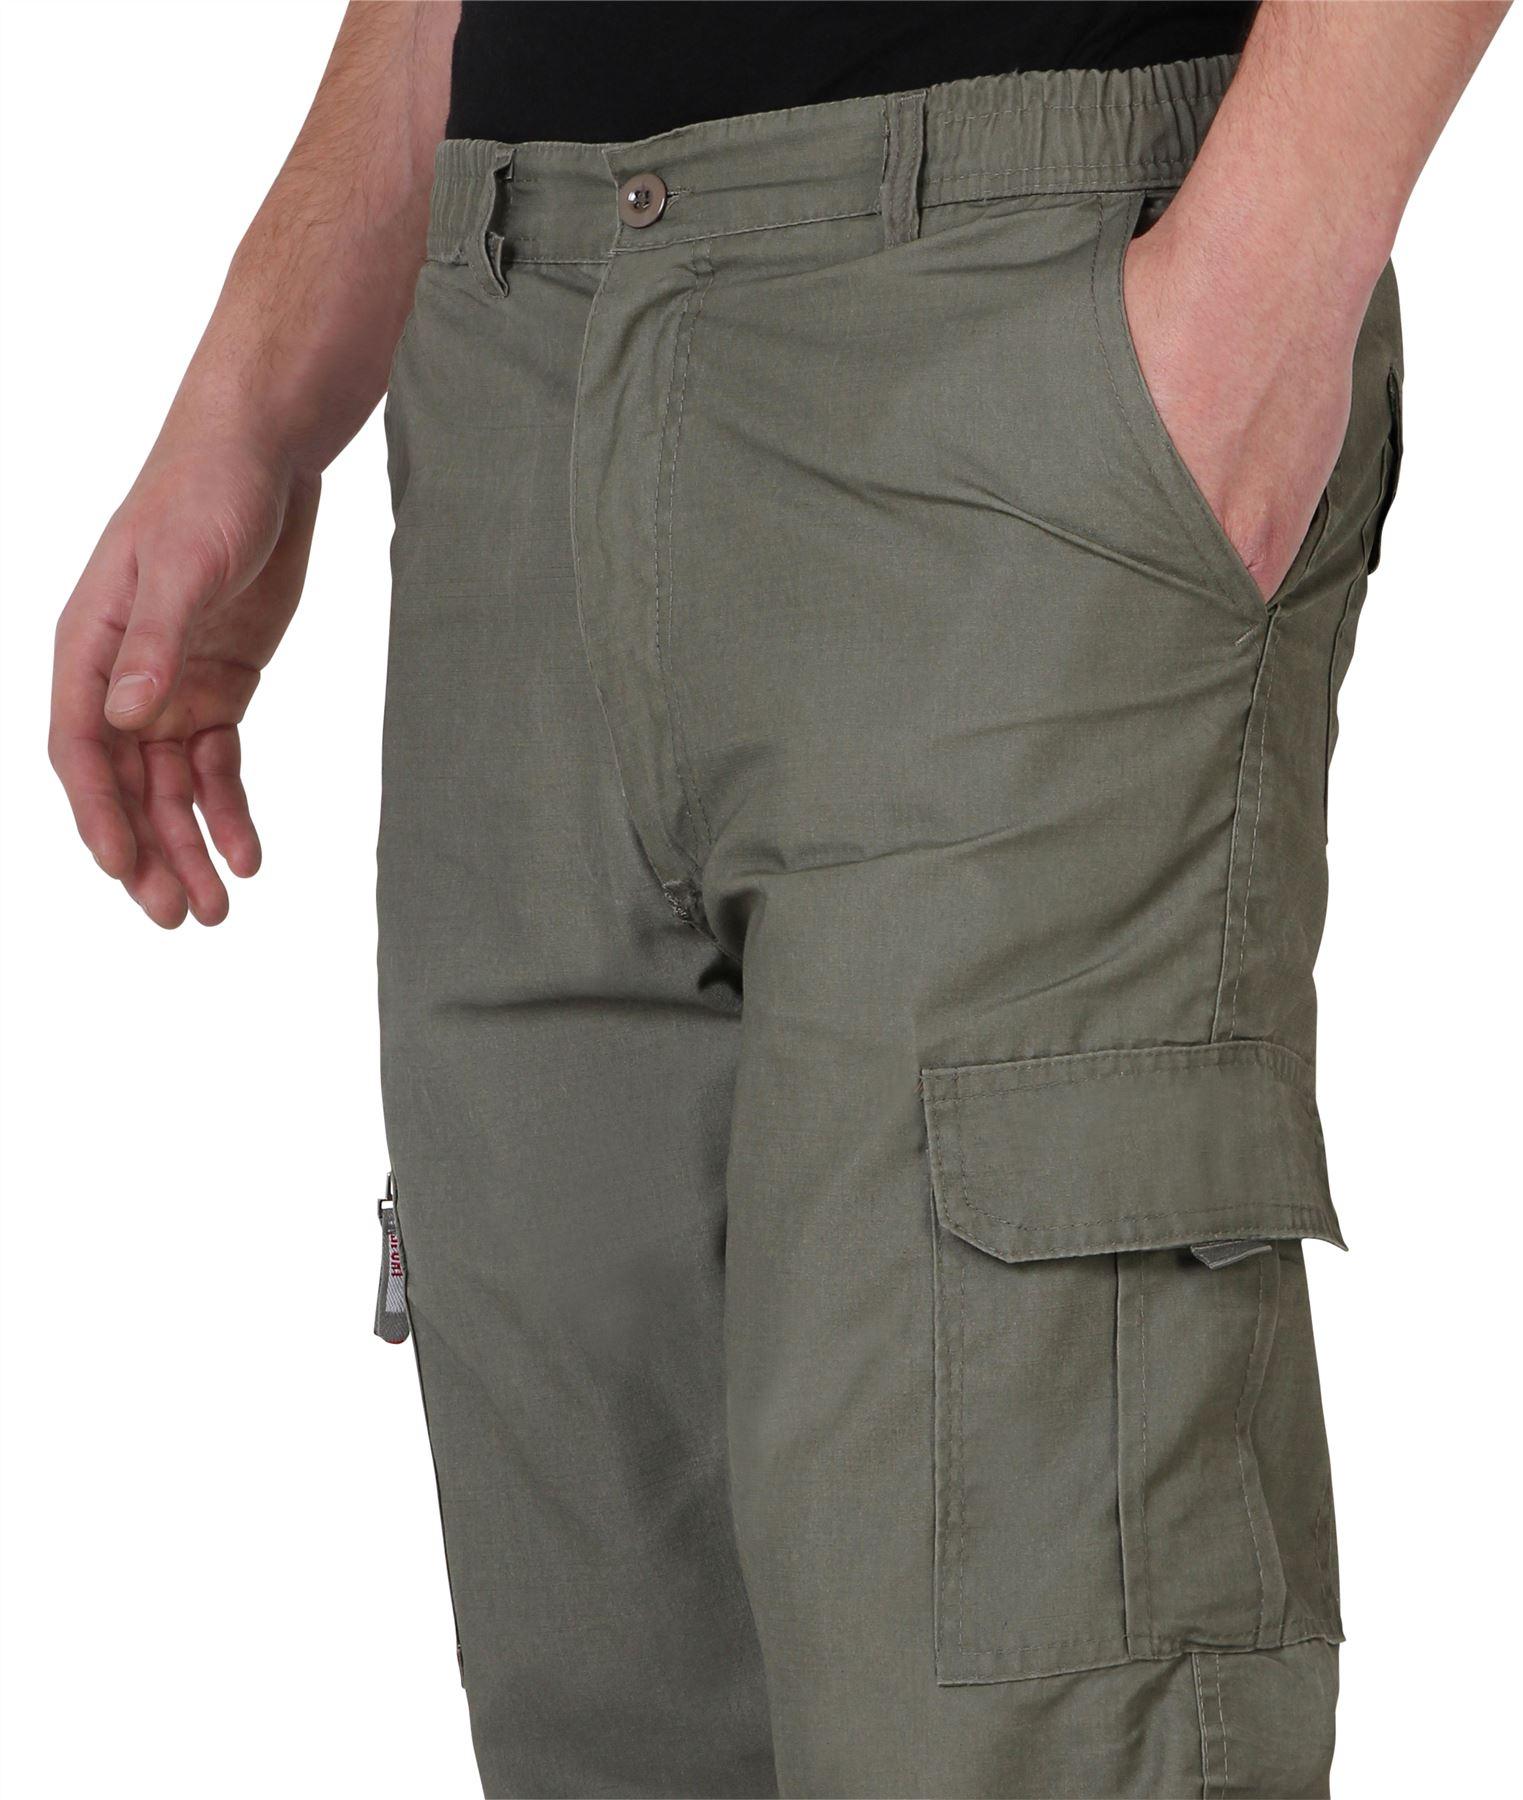 Pantalones-Hombre-Estilo-Cargo-Militar-Combate-Multibolsillos-Casual miniatura 12